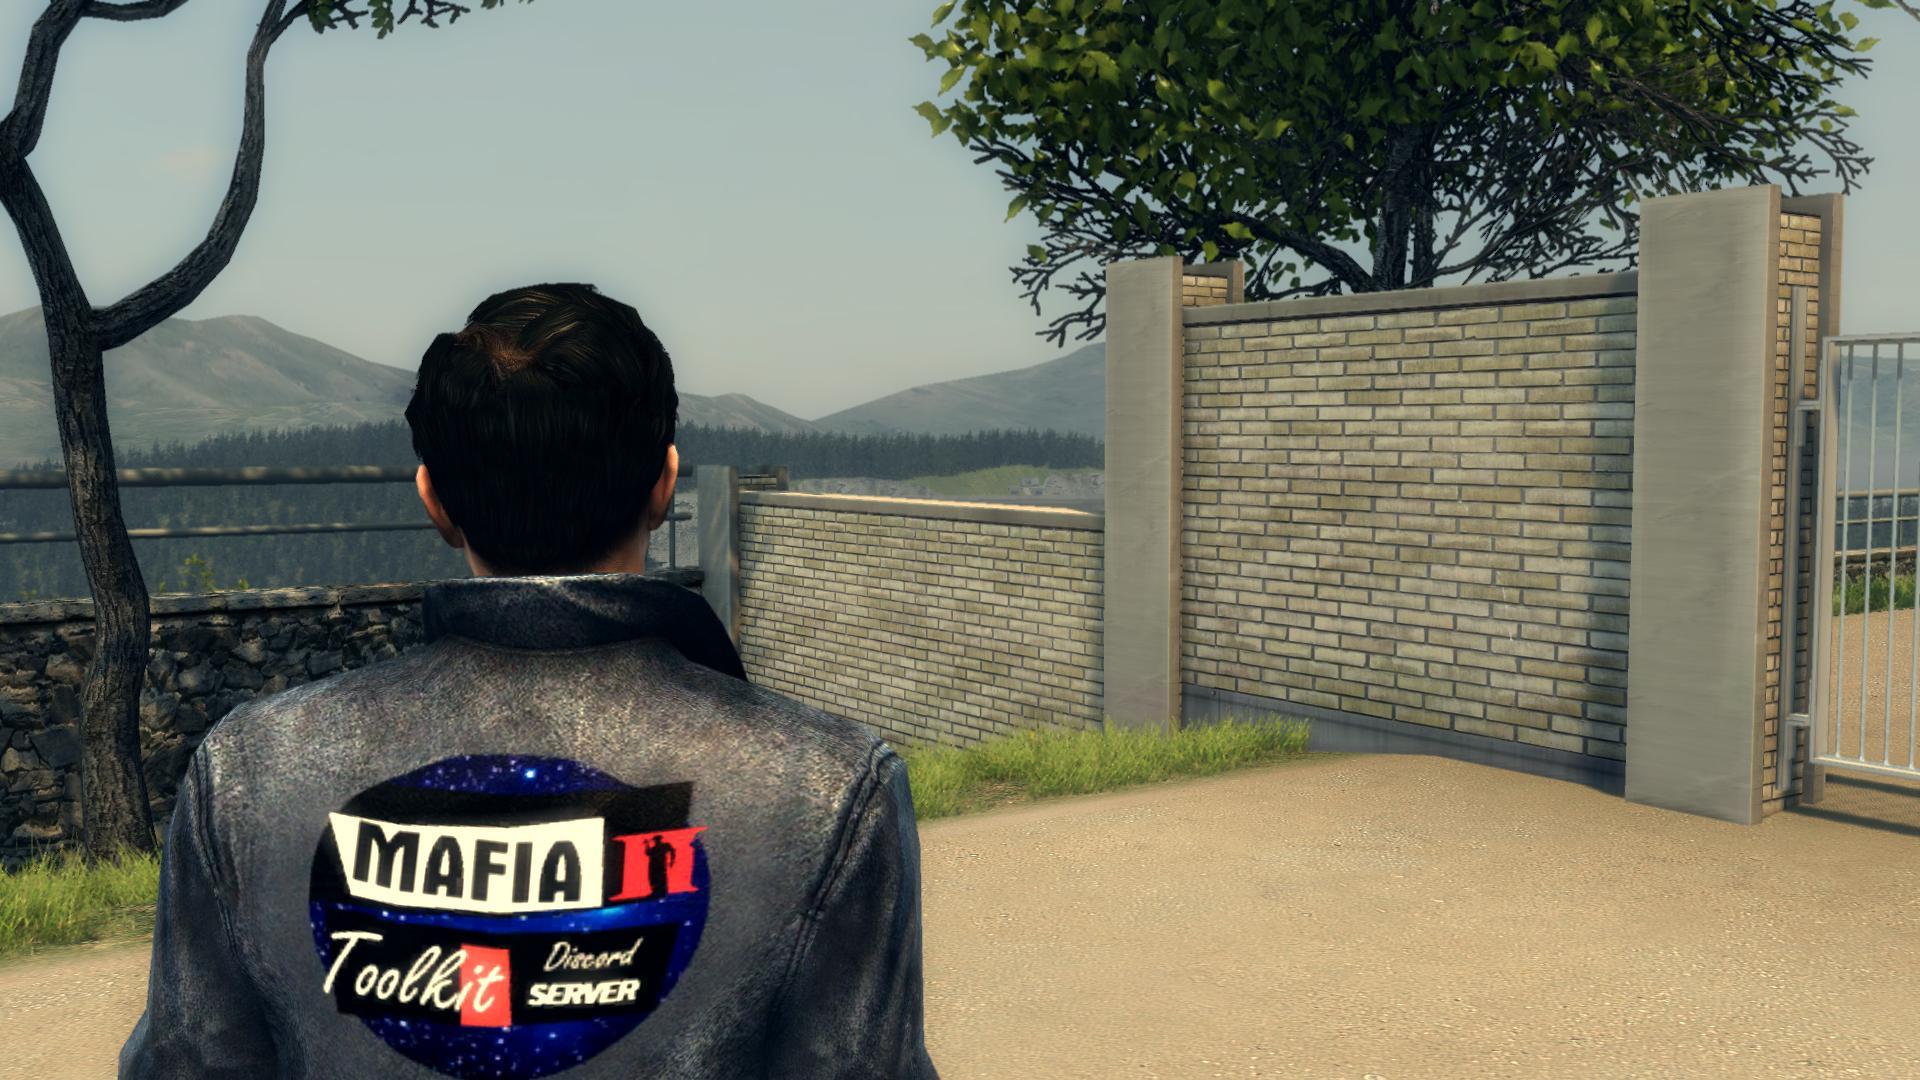 MAFIA 2 – Toolkit Jacket